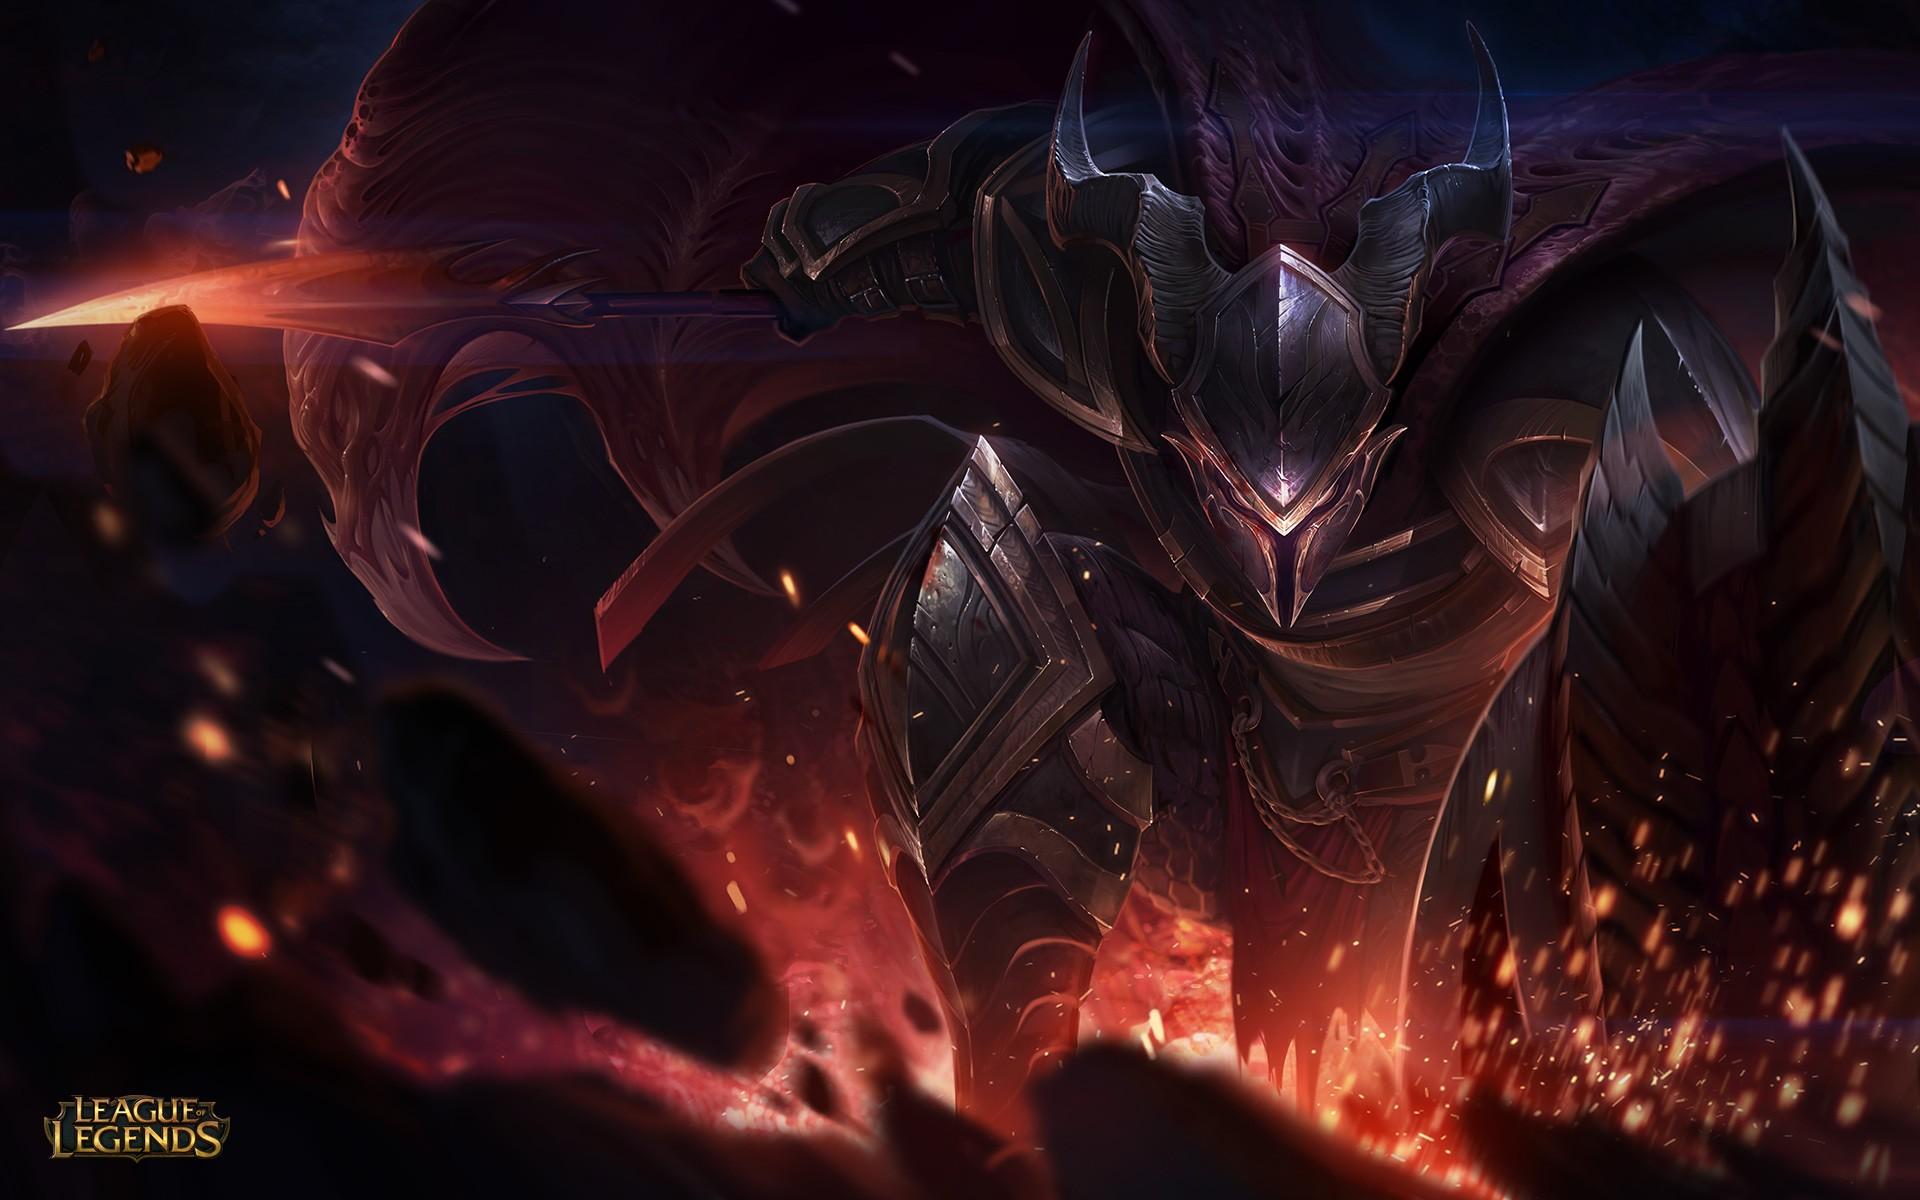 League of Legends Wallpaper x ID